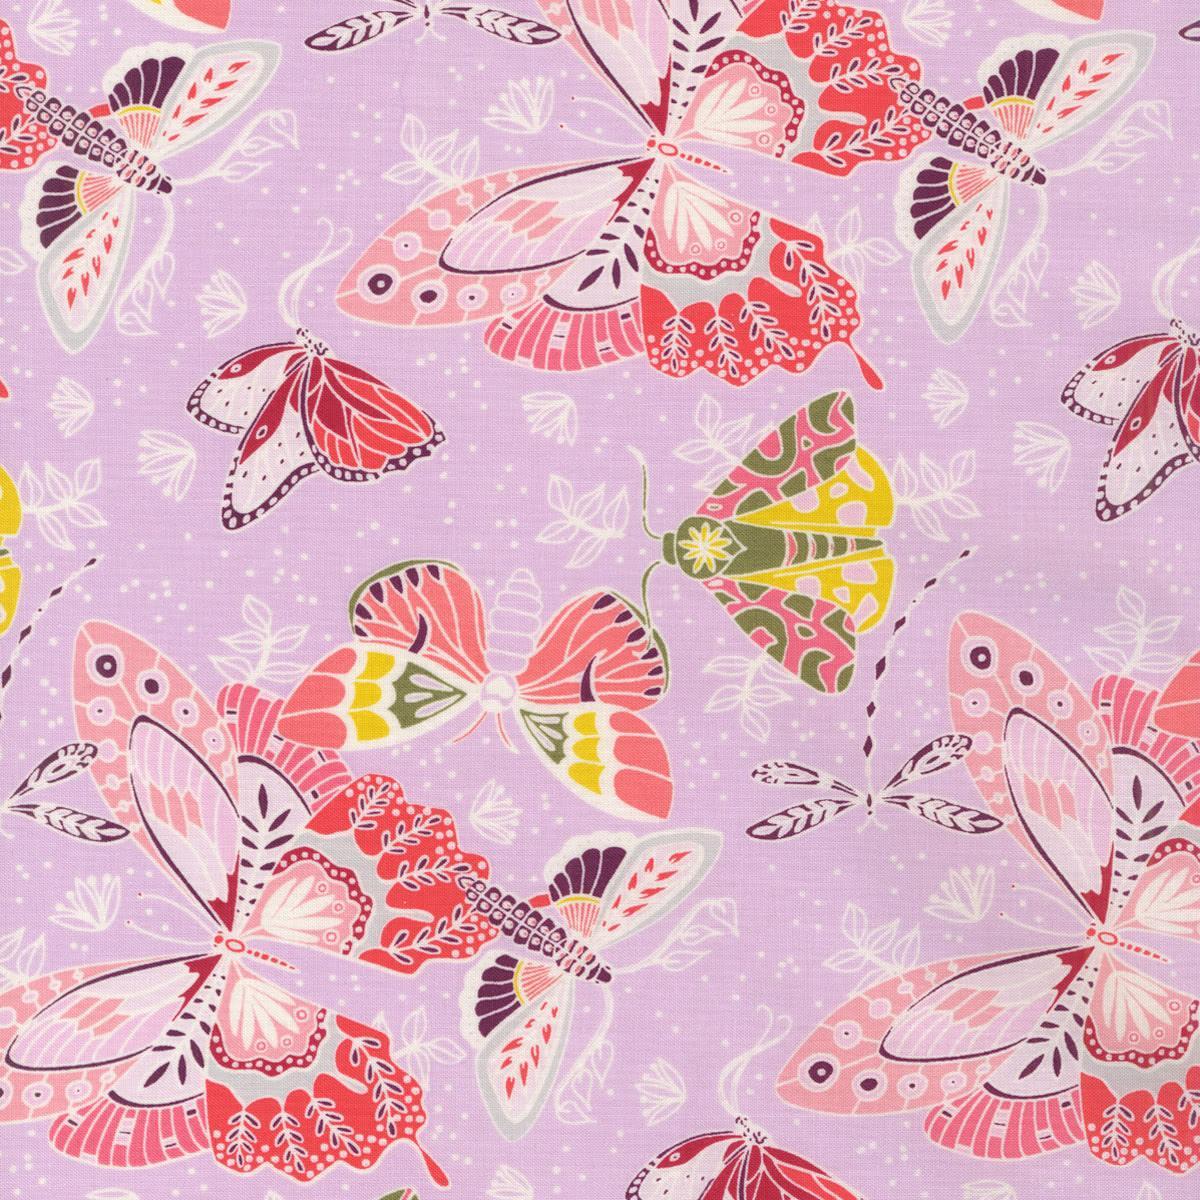 AERIAL Flock Yellow BTHY Half Yard or Continuous yardage Tamara Kate 52179-3 Windham Fabrics  Great Mask fabric